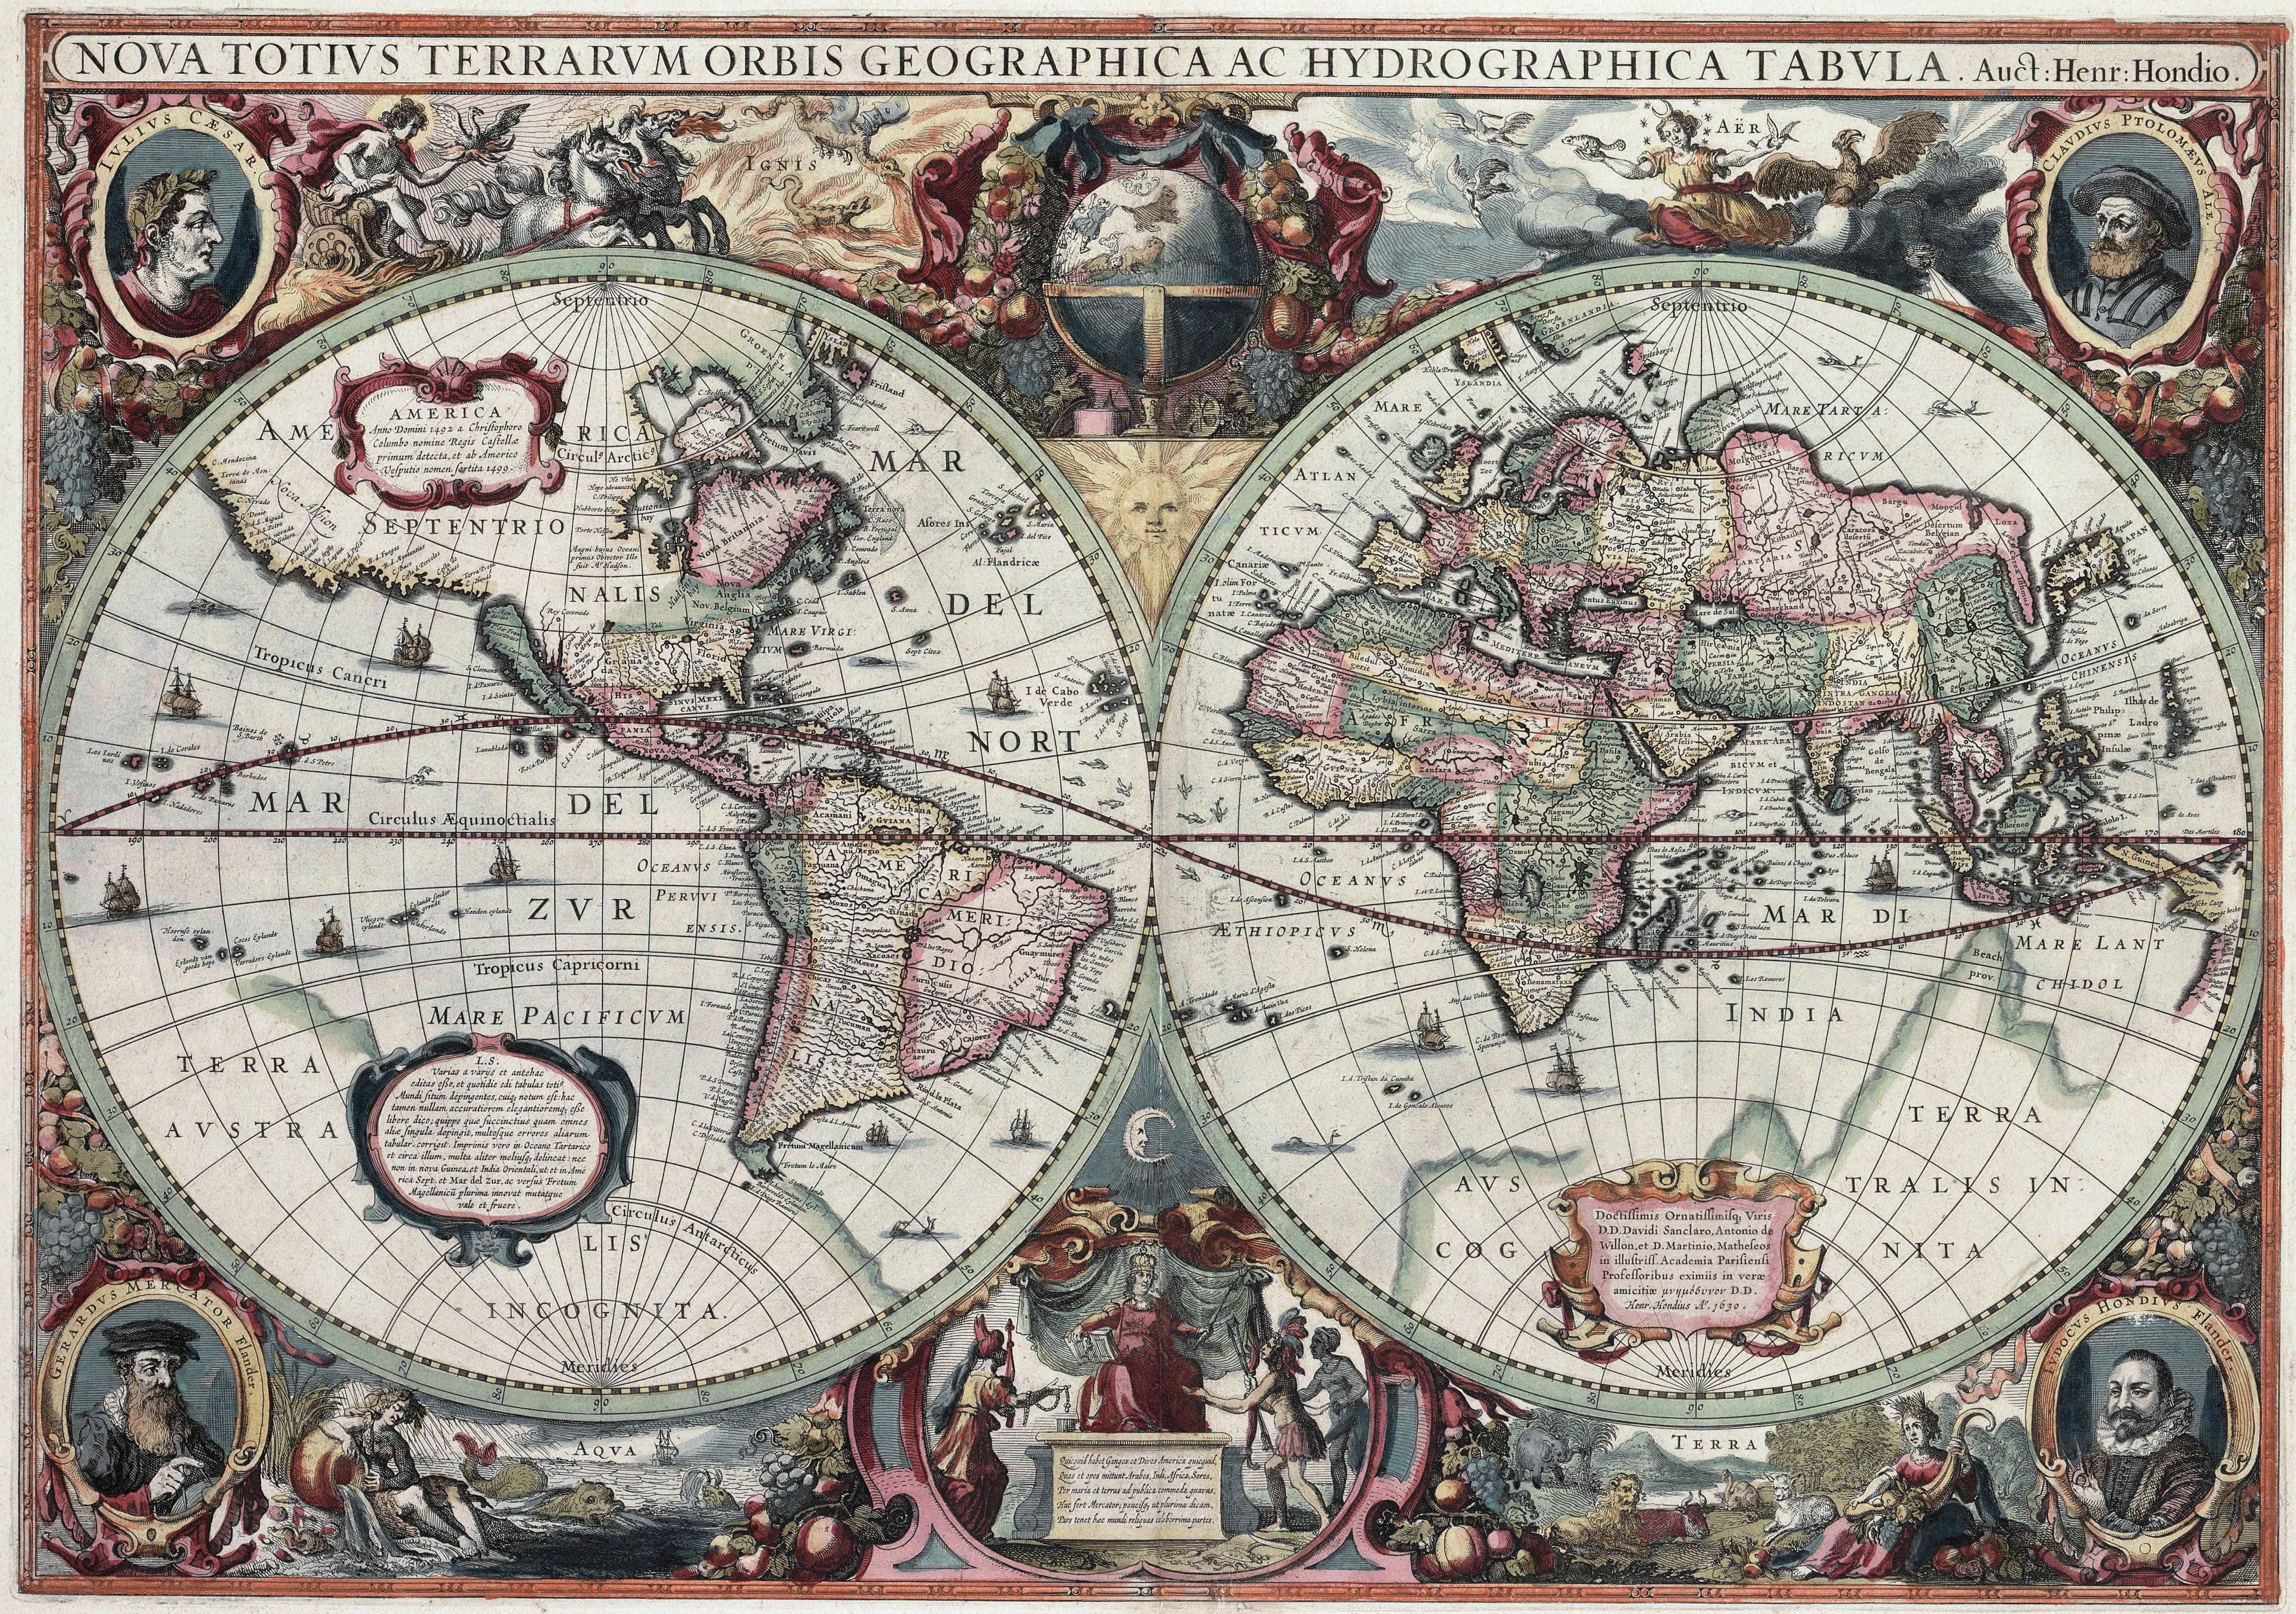 Nova Totius Terrarum Orbis Cartography An Overview